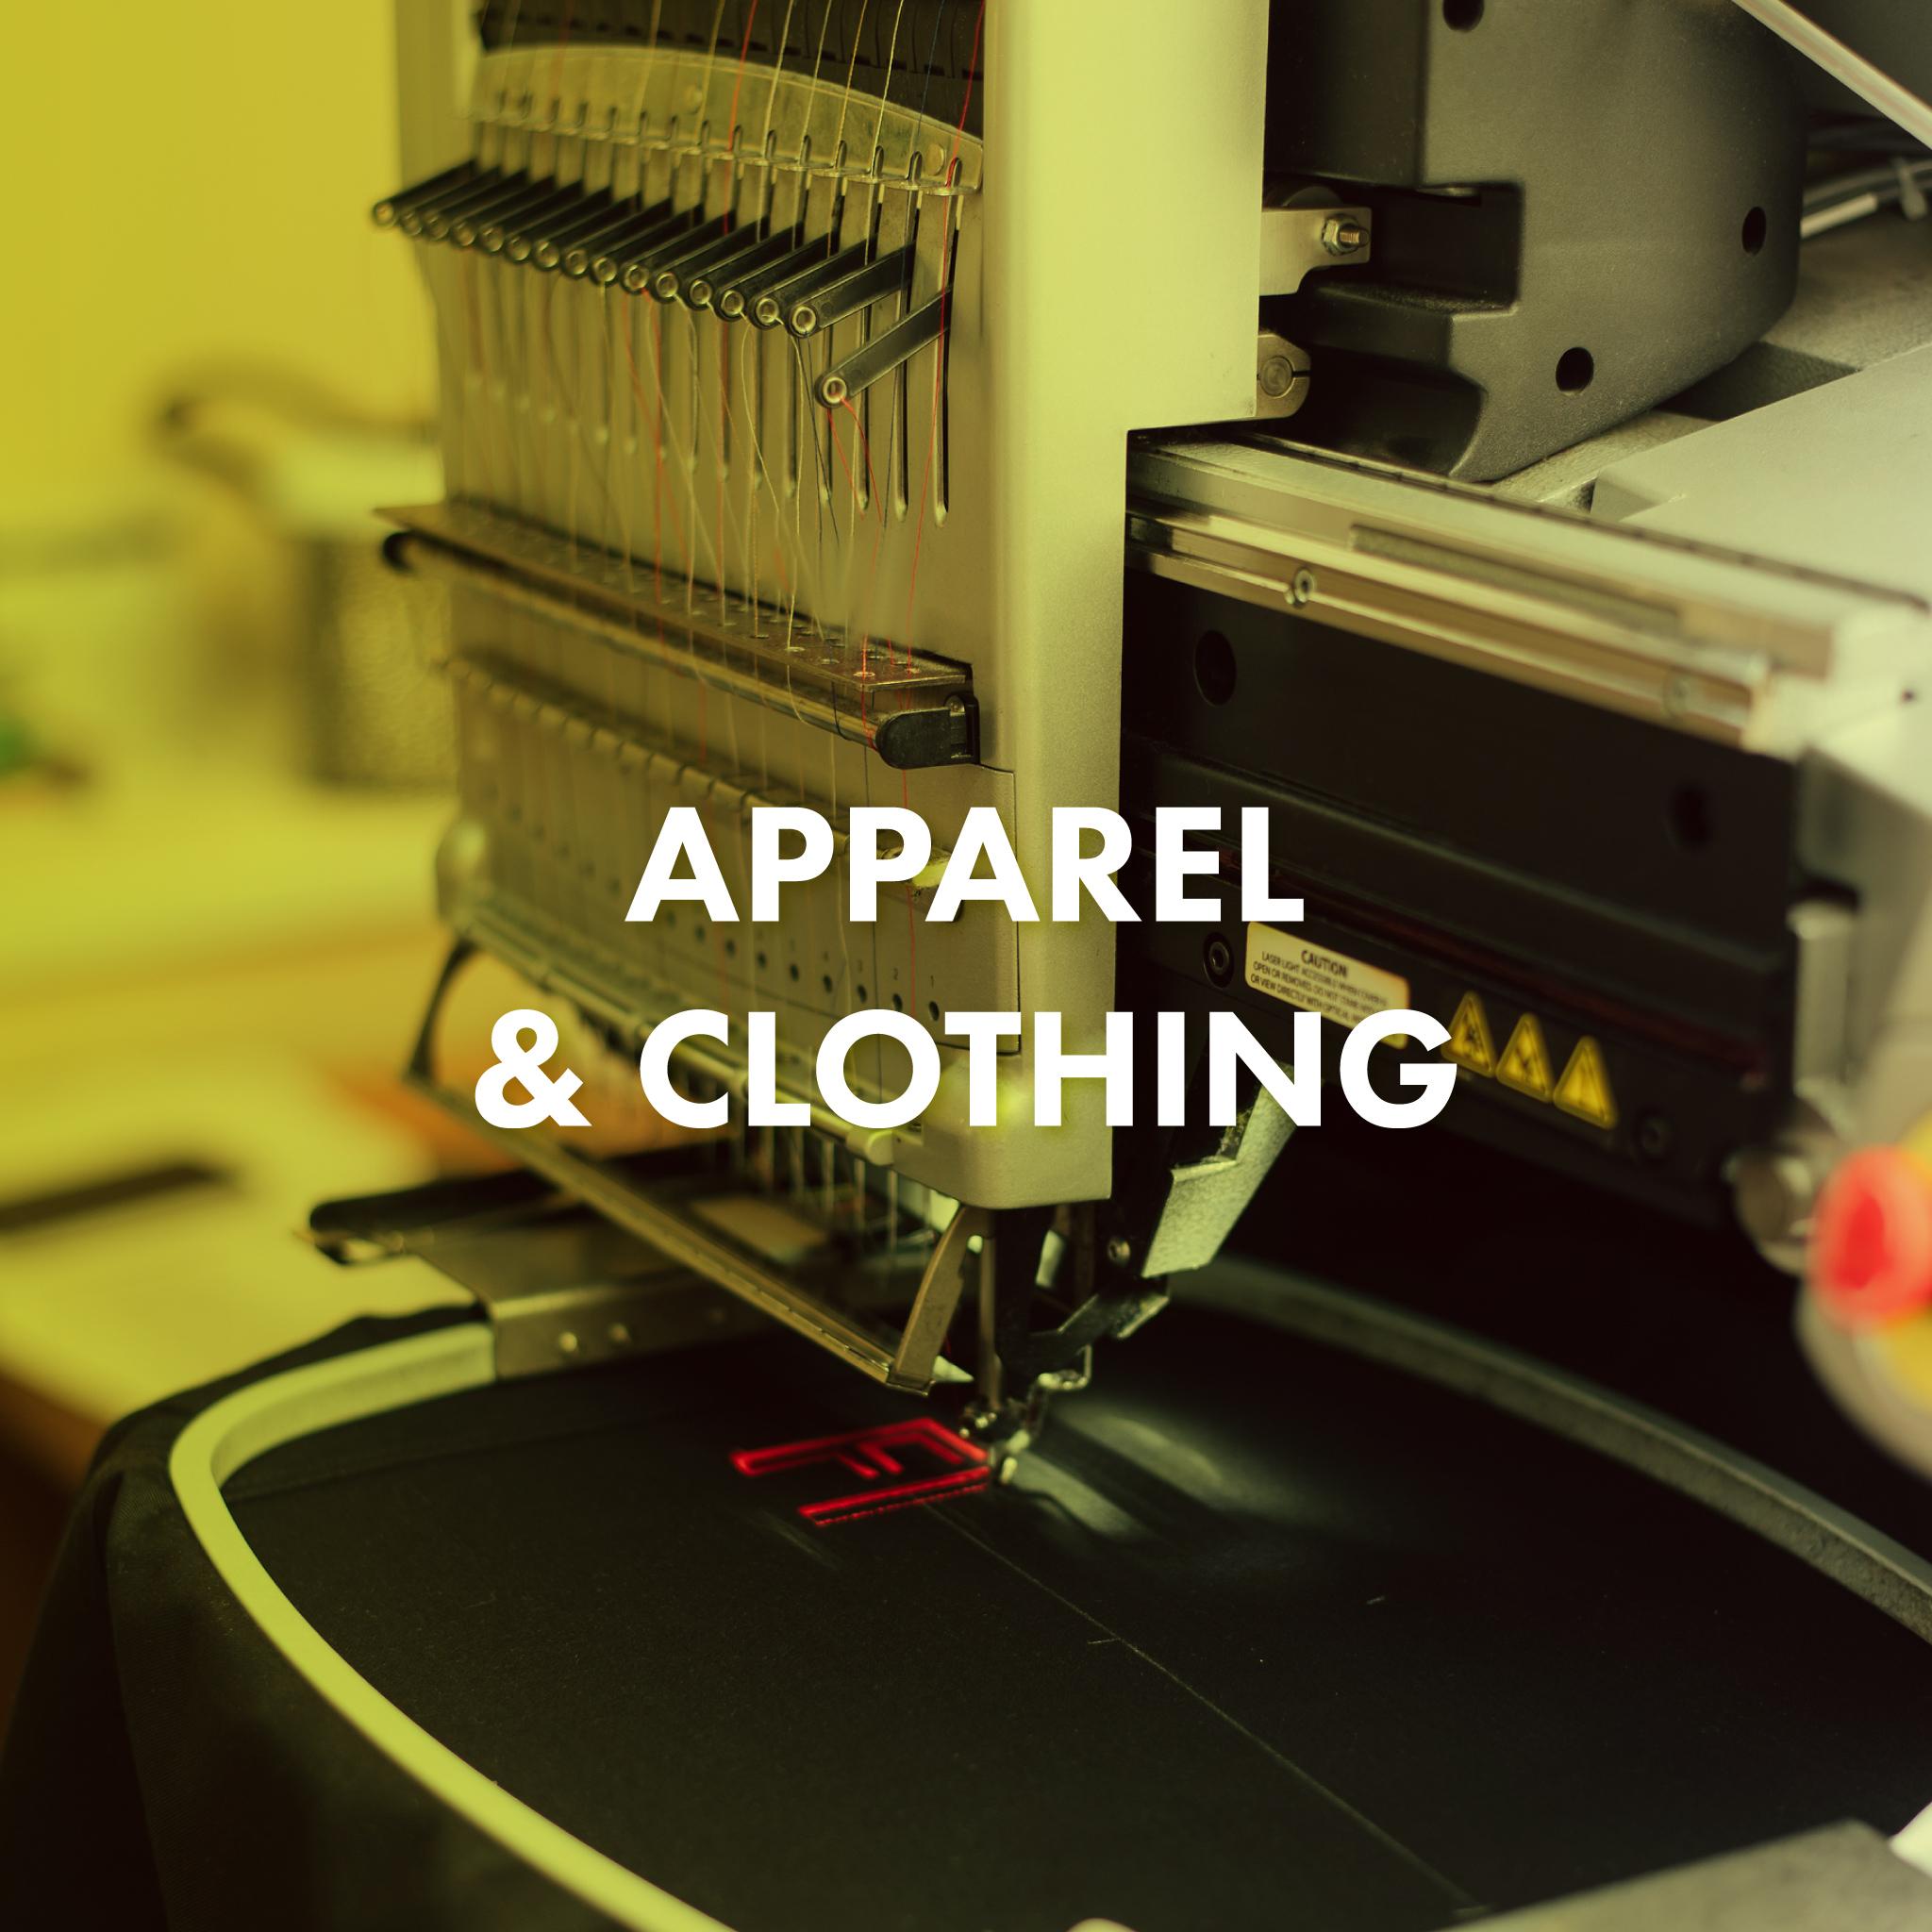 Apparel-&-Clothing-Image.jpg